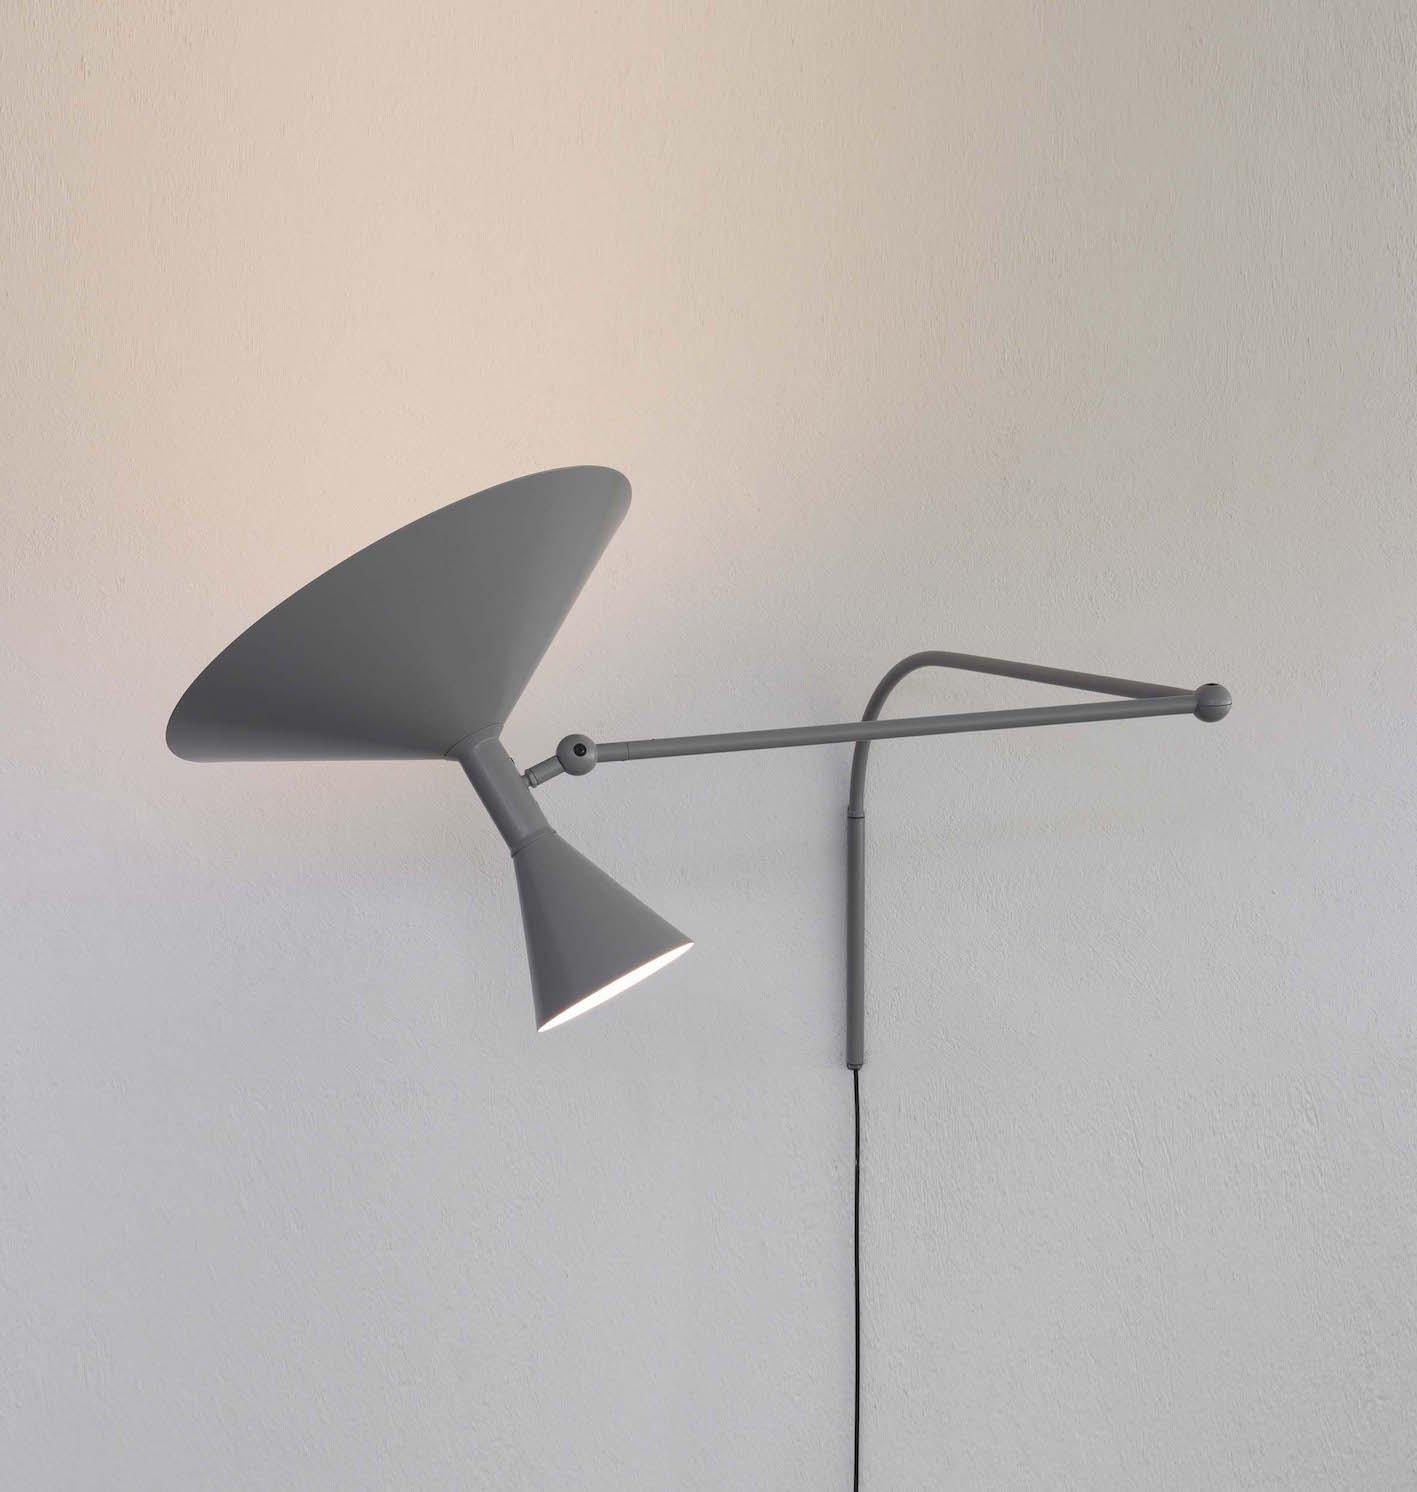 lampe de marseille nemo le corbusier klat. Black Bedroom Furniture Sets. Home Design Ideas